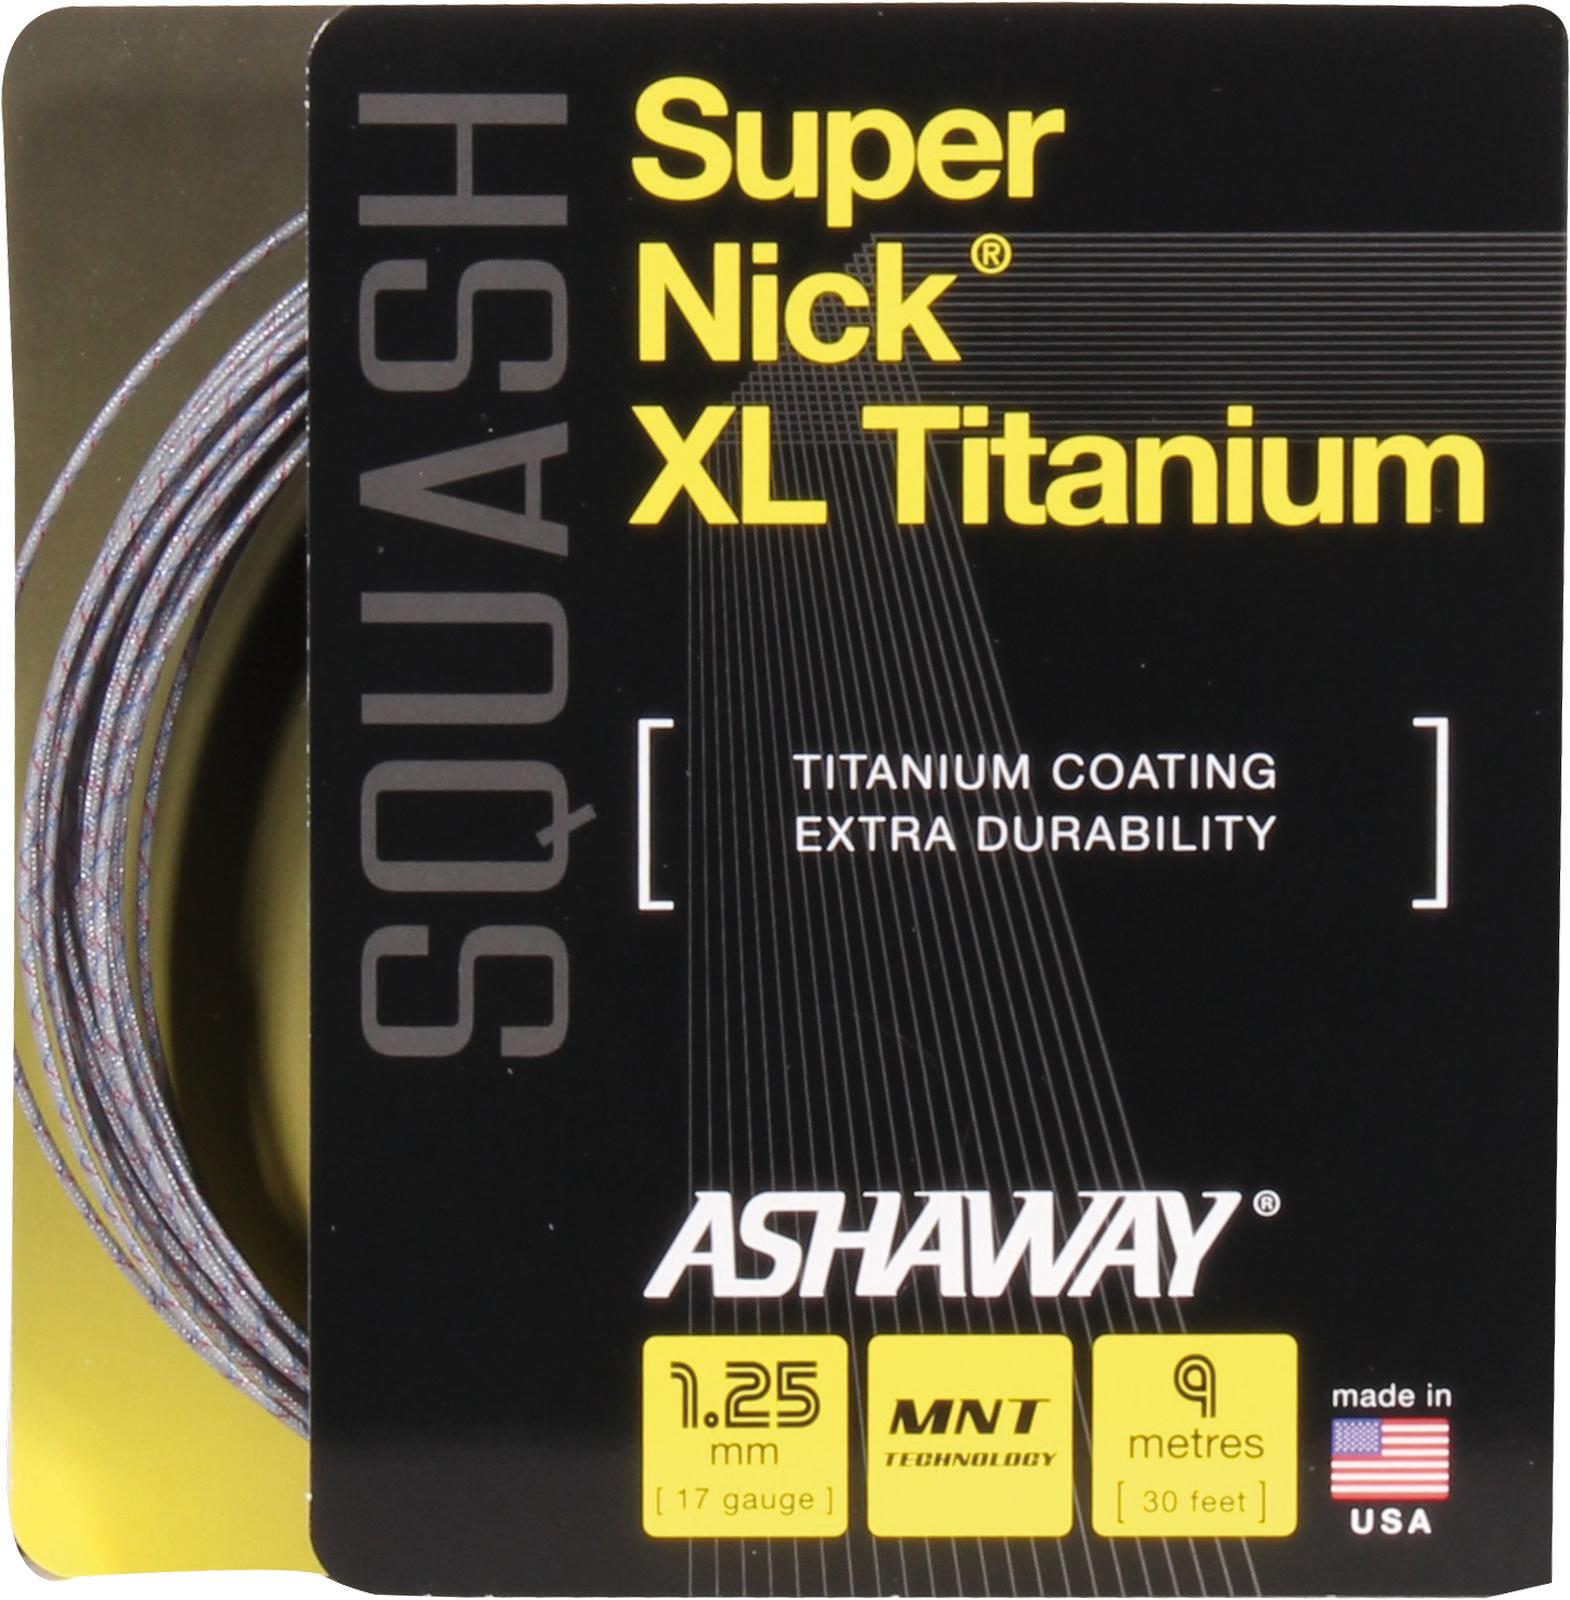 Ashaway SuperNick XL Titanium Squash Saite